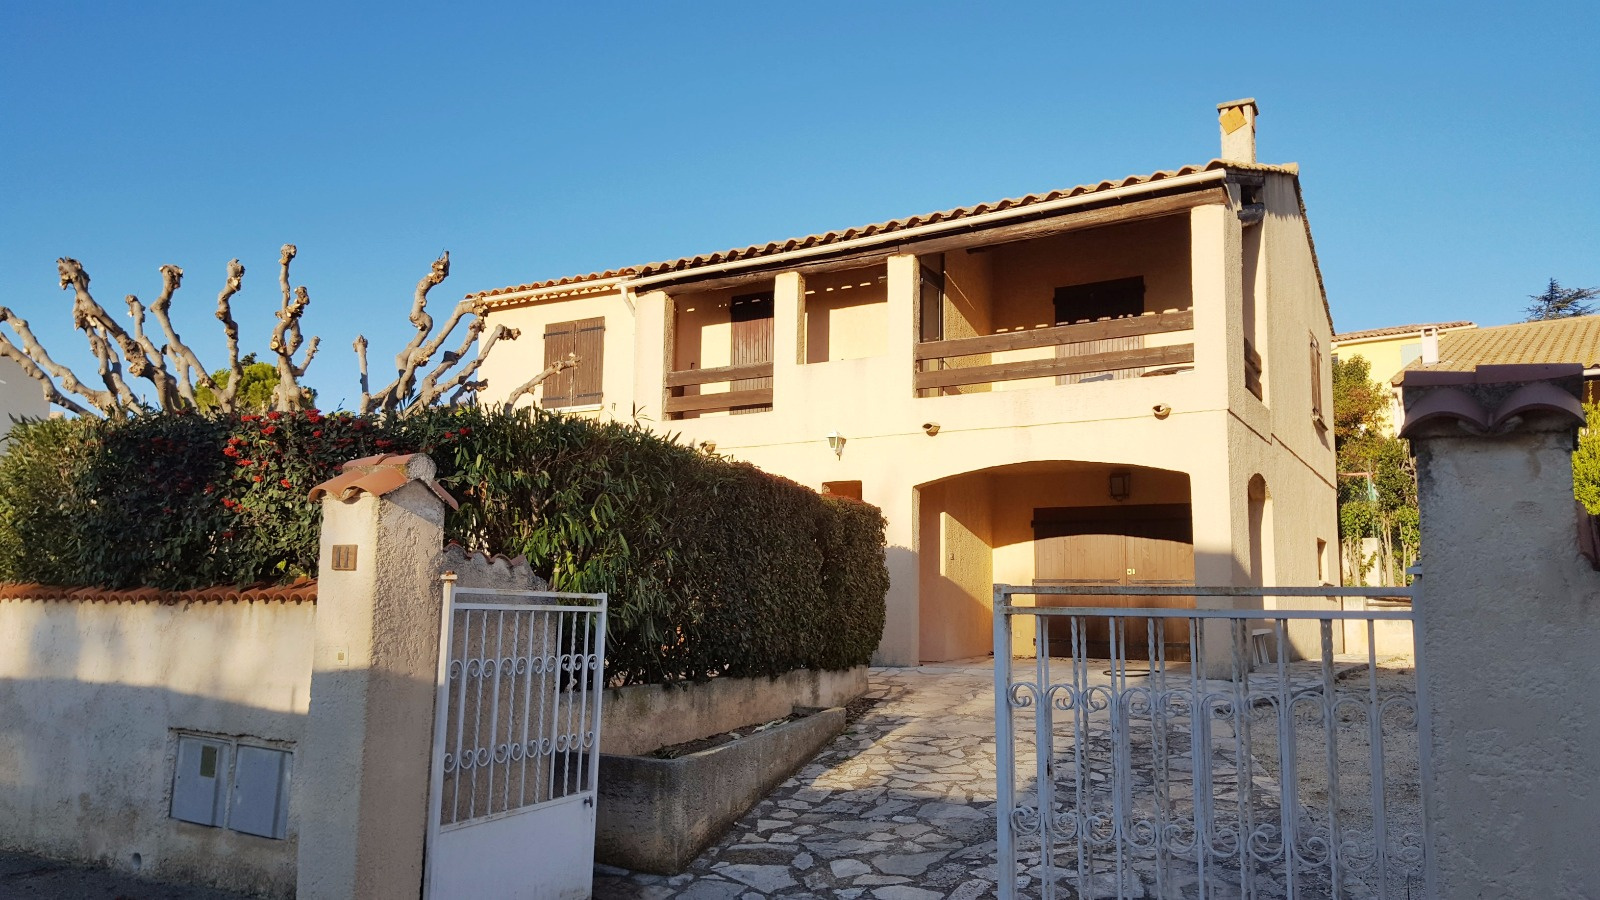 Vente chateau gombert village 13013 marseille villa t5 for Prix garage marseille